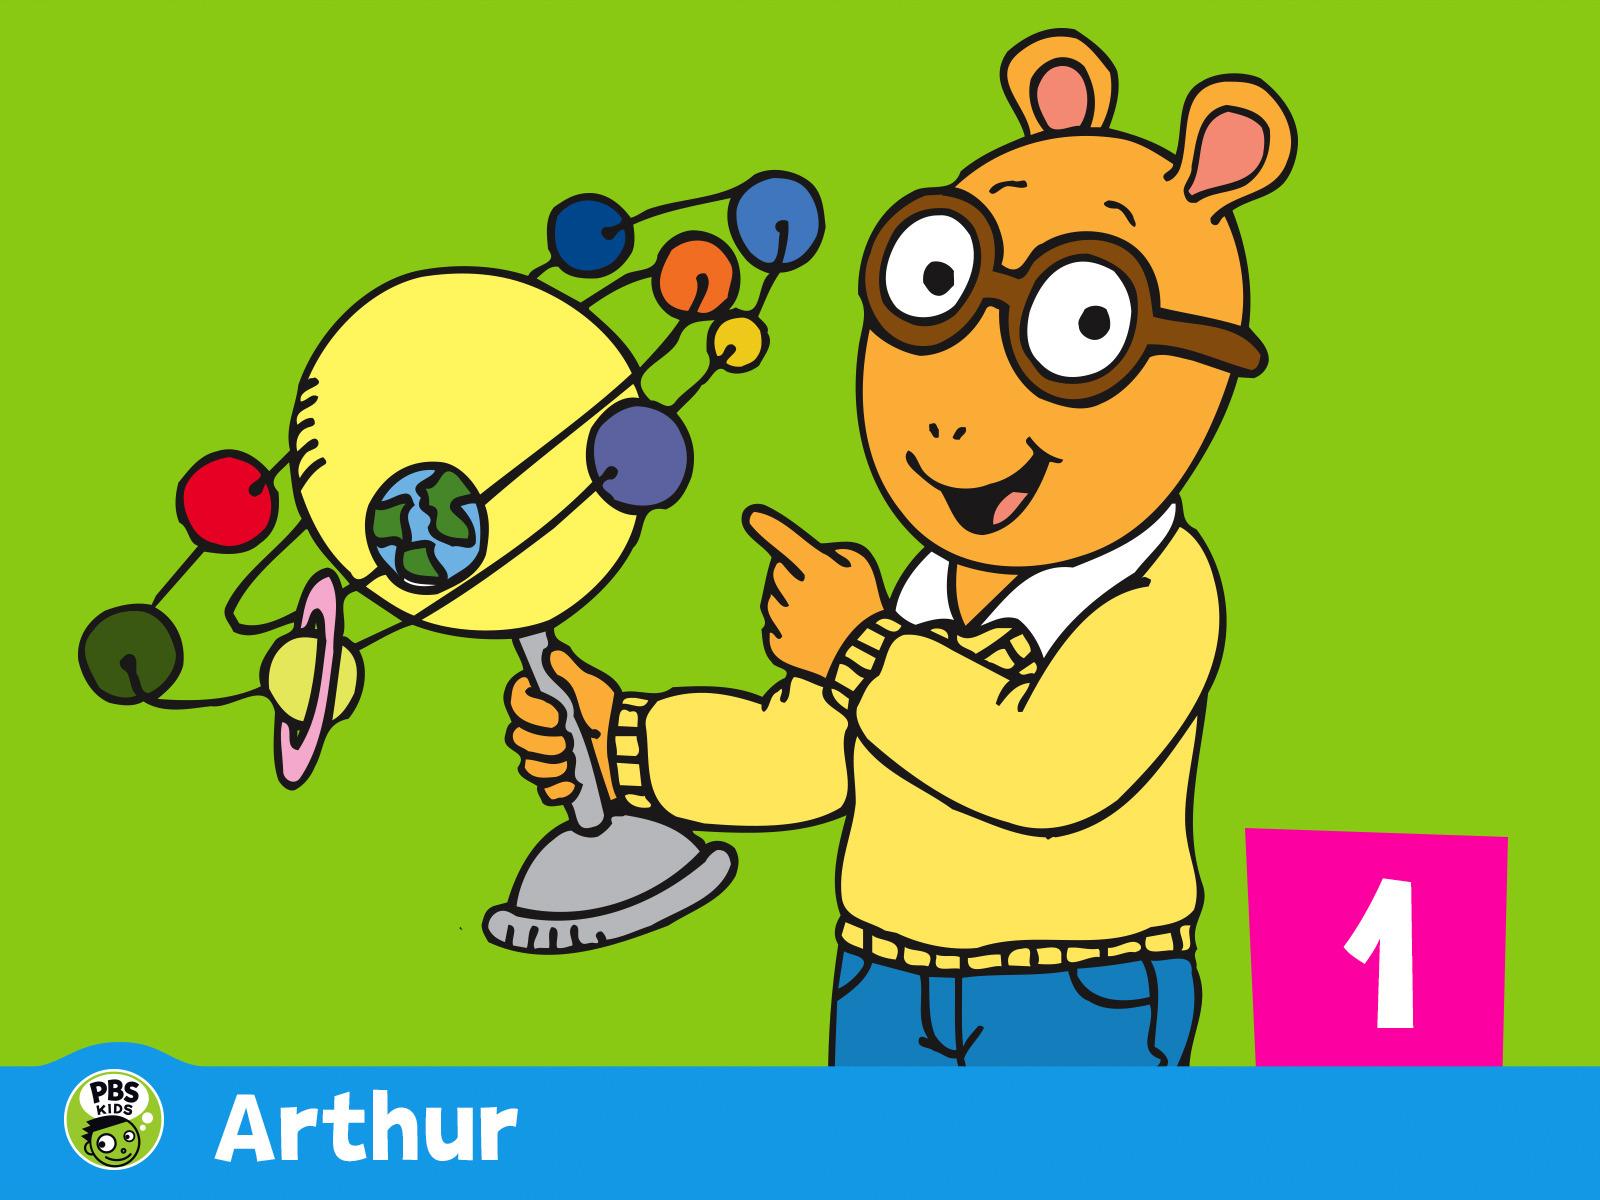 Watch Arthur Season 1 Episode 30: Grandpa Dave's Old Country